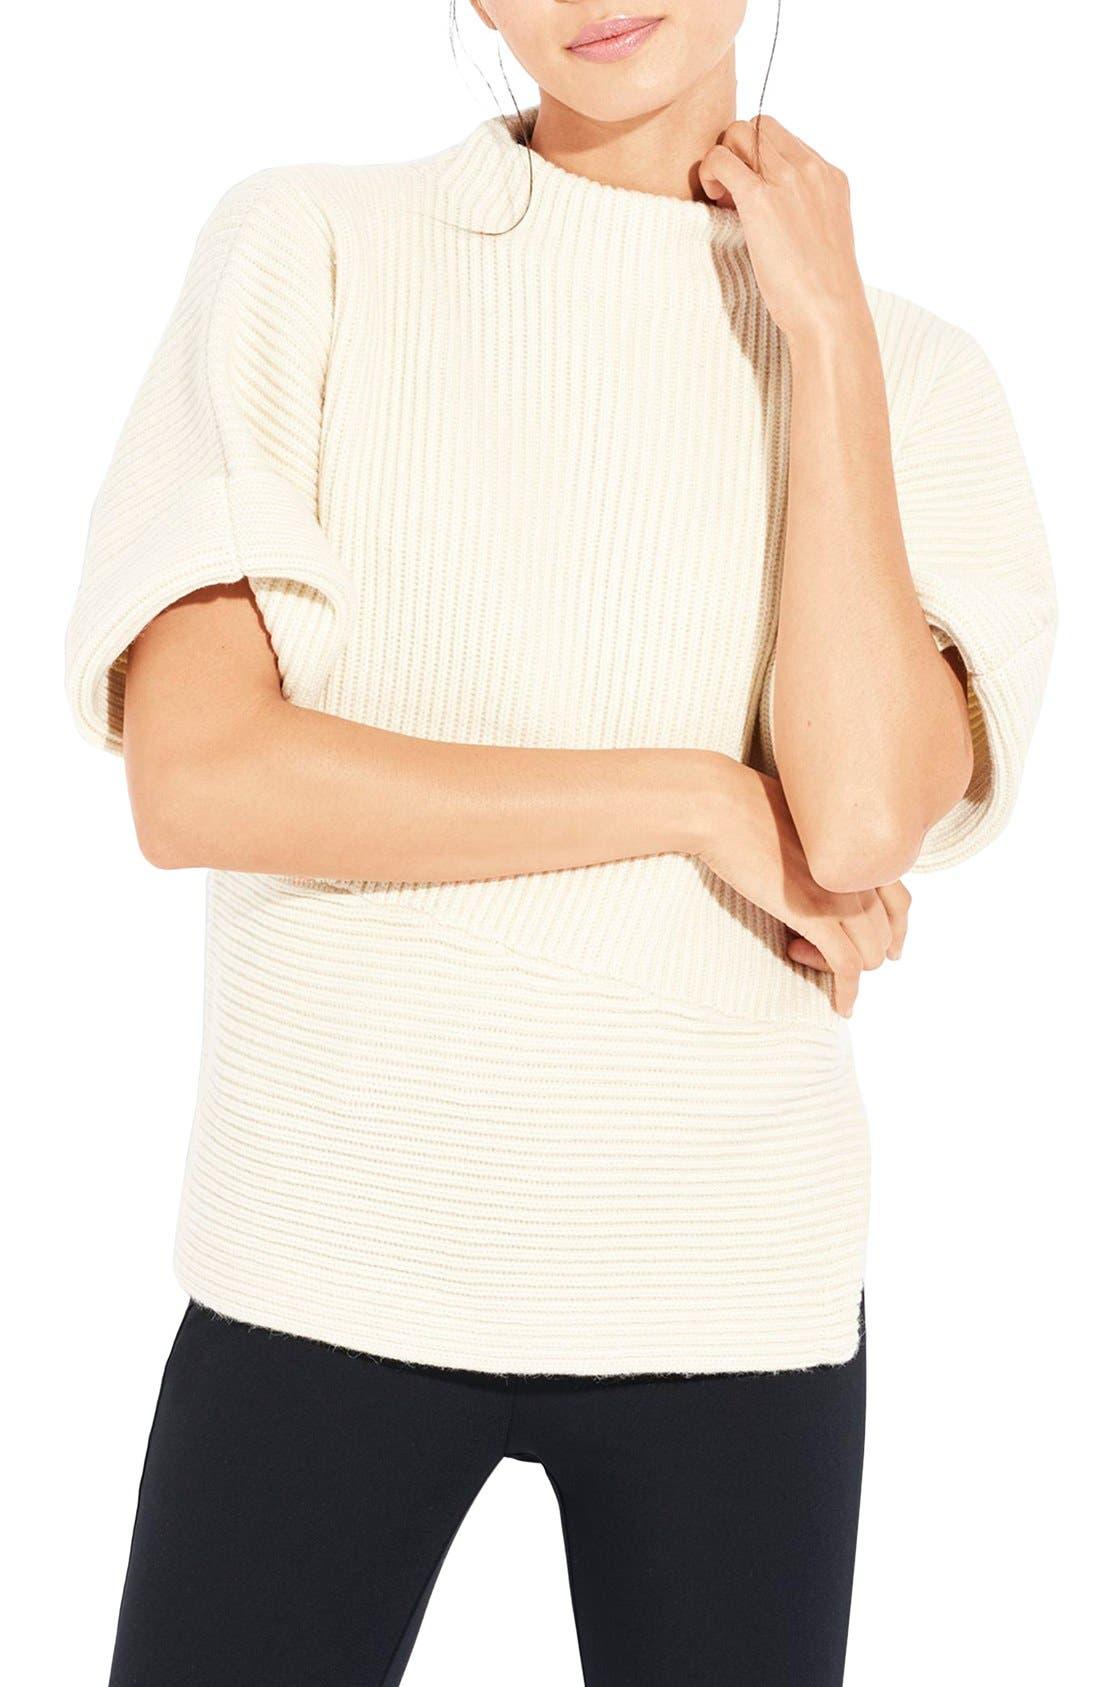 Alternate Image 1 Selected - AYR The Fika Merino & Alpaca Rib Sweater